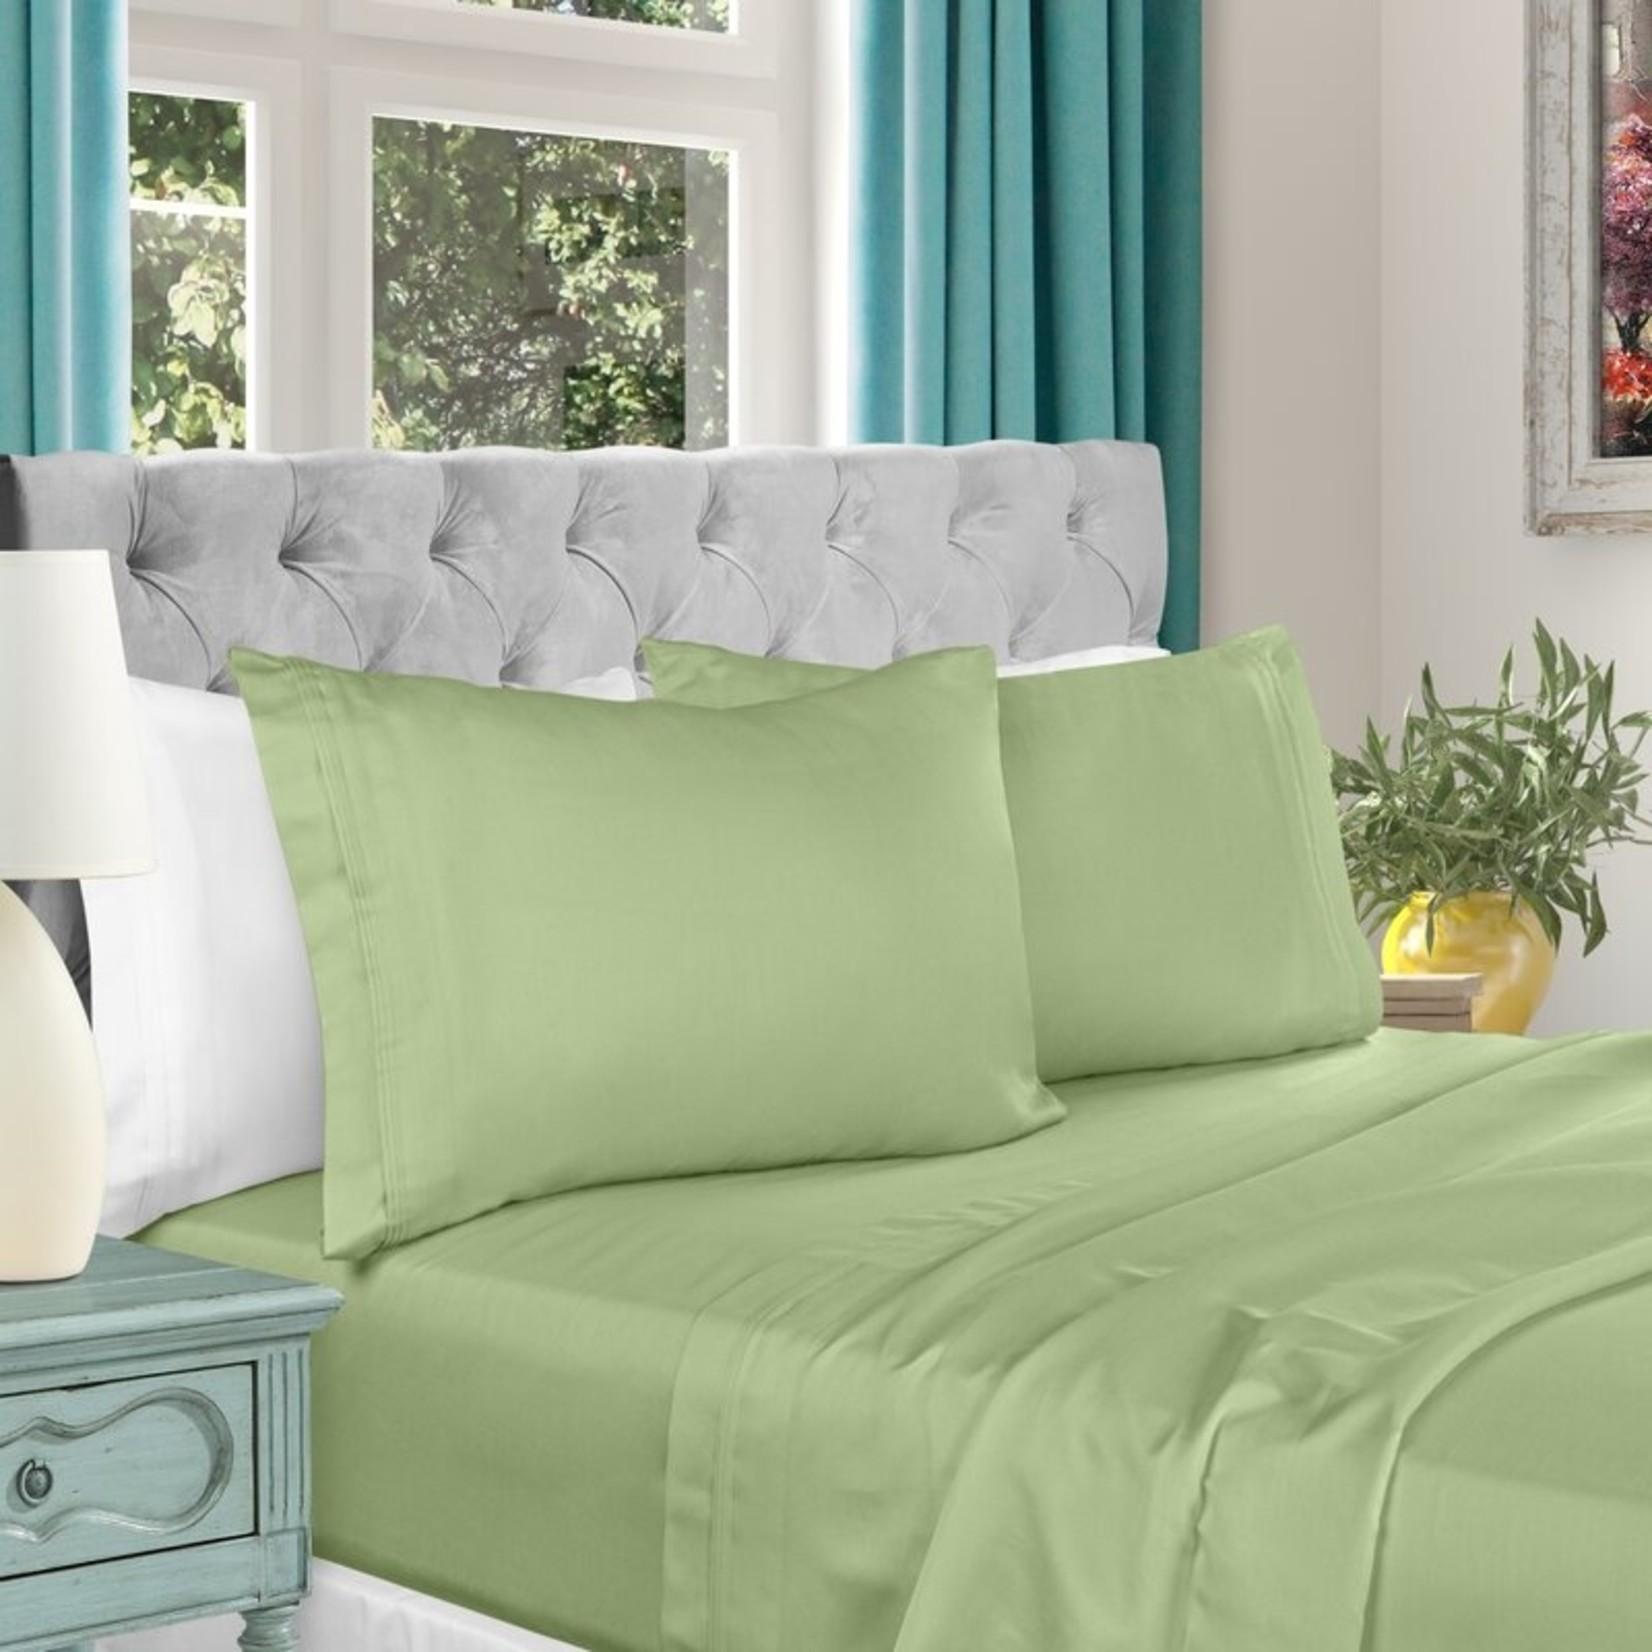 *Cal King - Amherst 1000 Thread Count Egyptian Certified Cotton Sateen Sheet Set - Final Sale